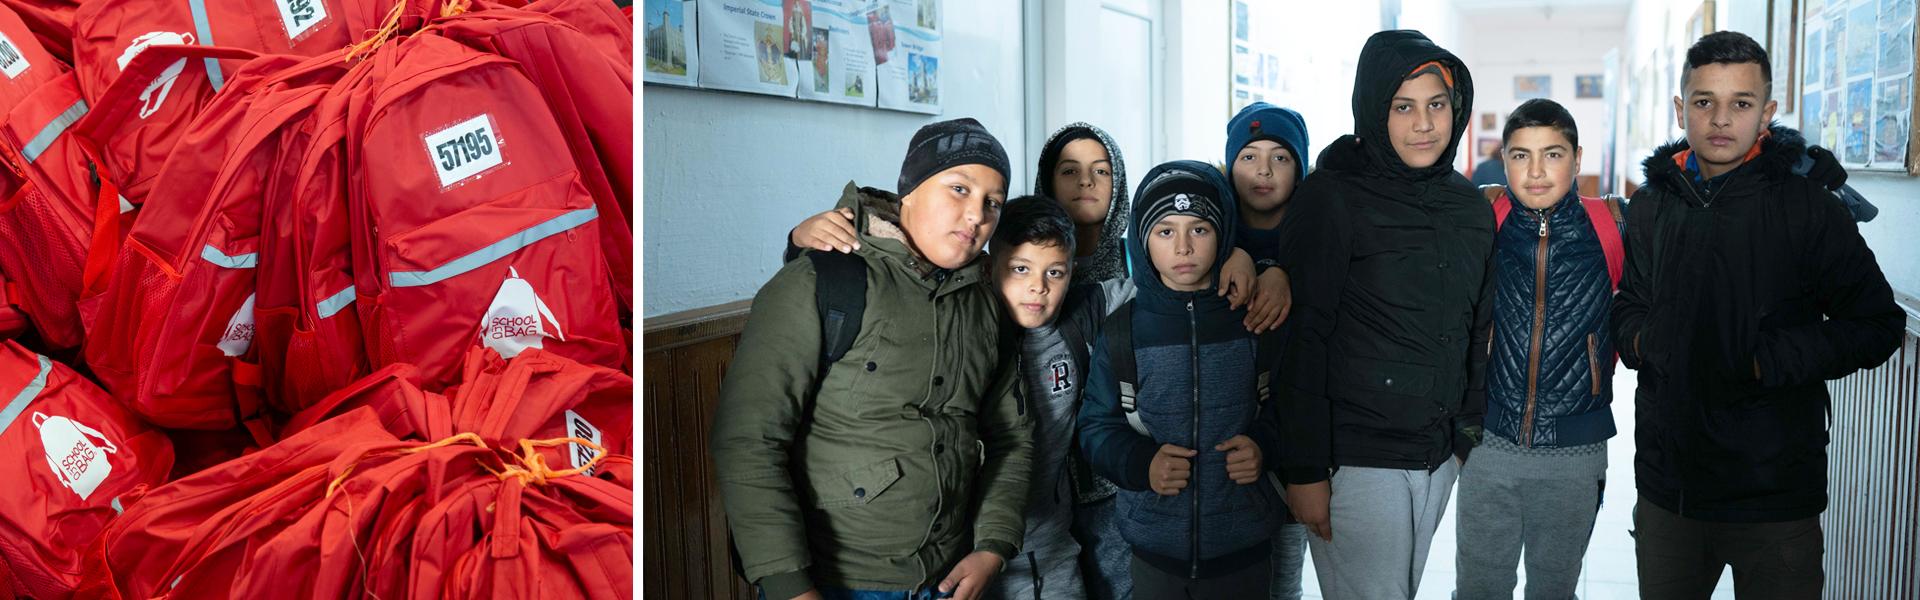 Romania Orphanage Gallery 1